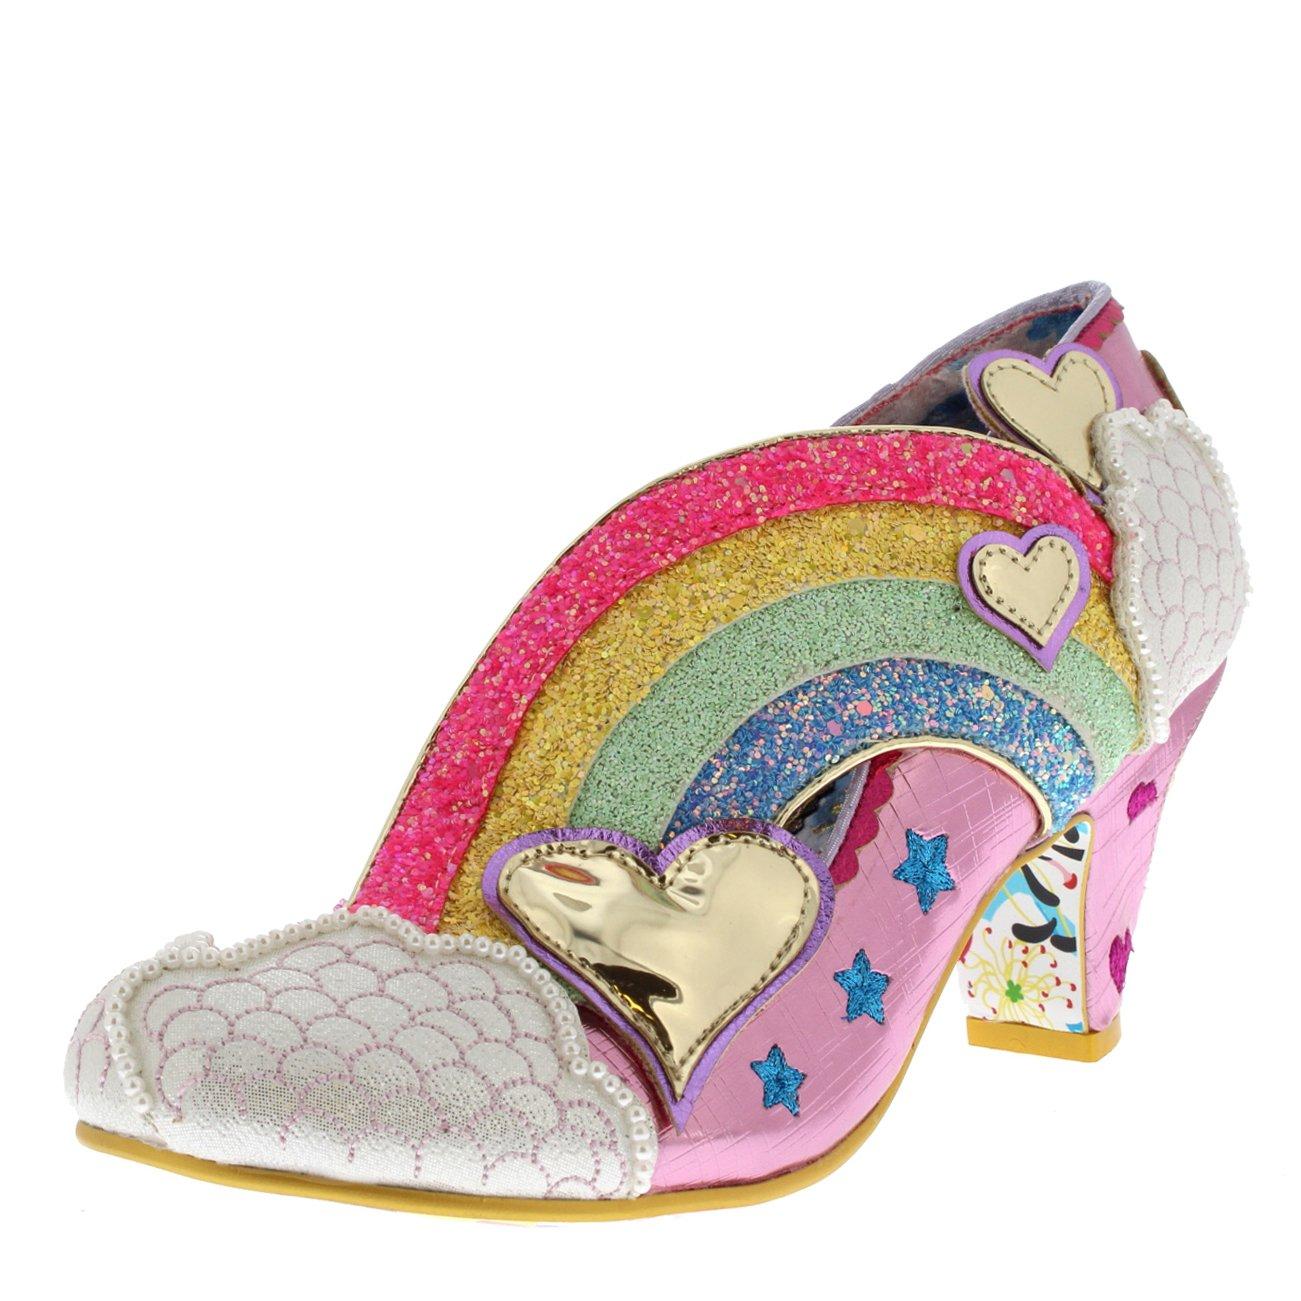 Irregular Choice Womens Summer of Love Glitter Rainbow Wedge Heels - Pink - 6.5